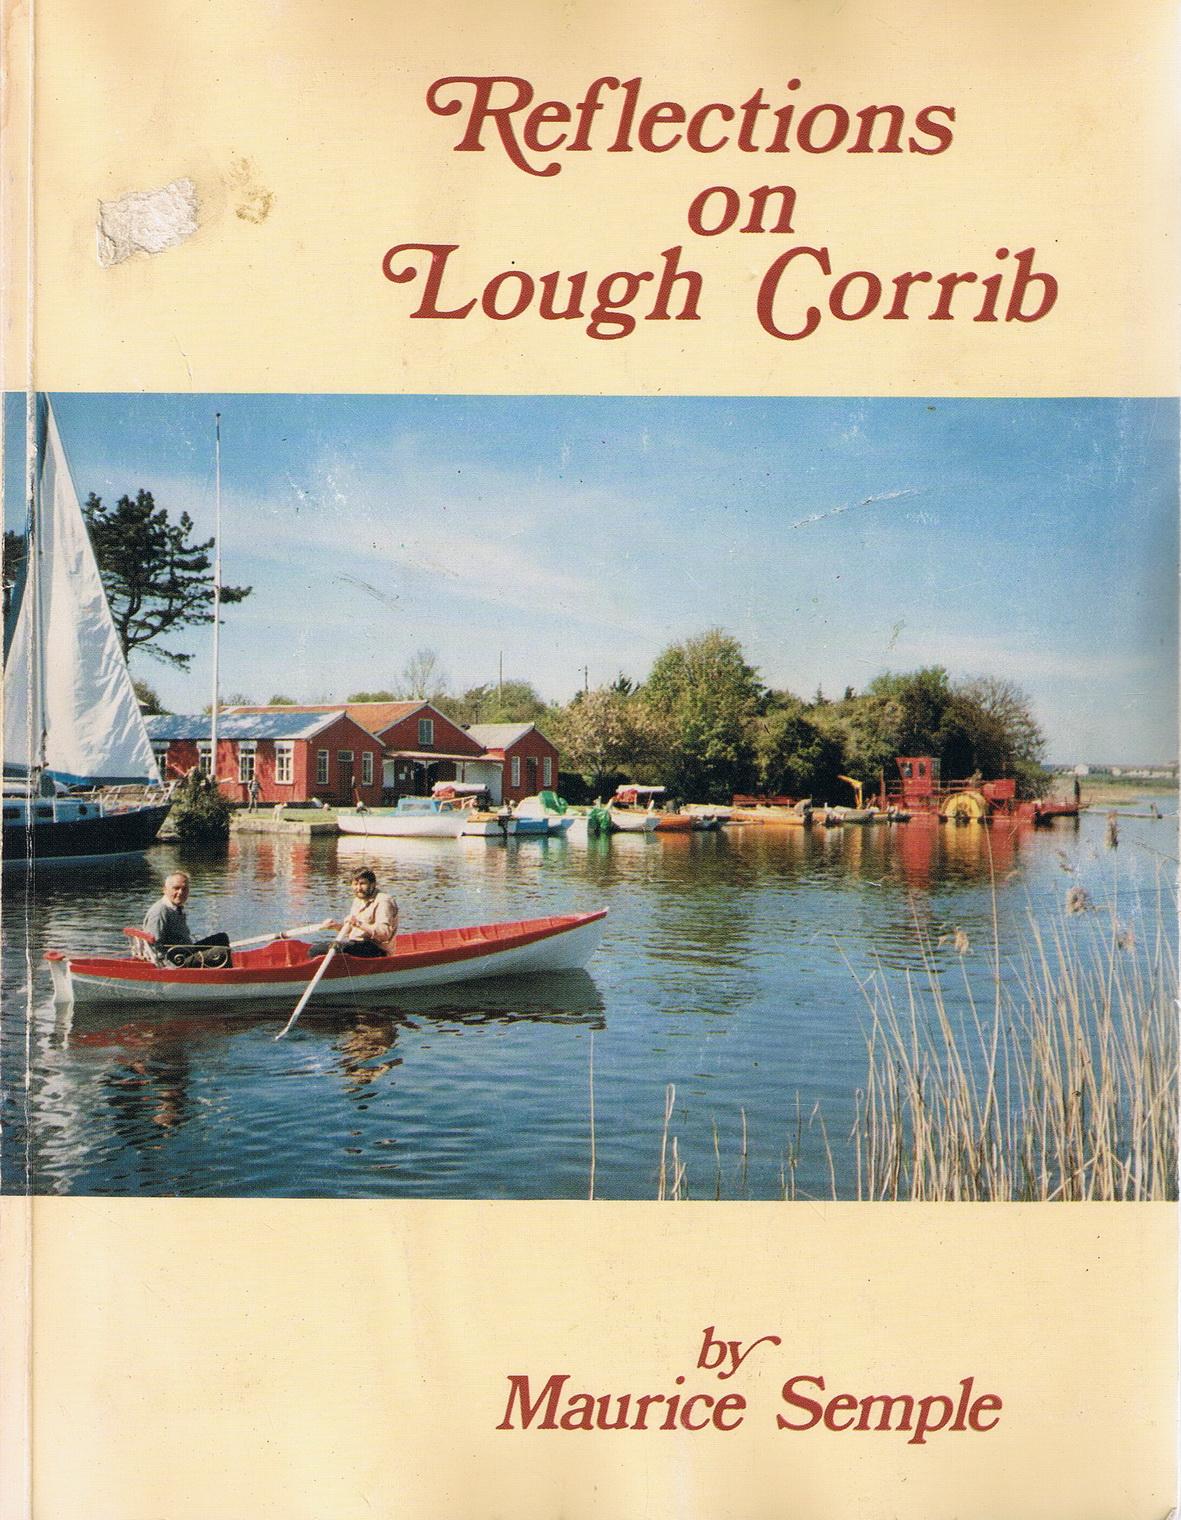 Reflections on Lough Corrib